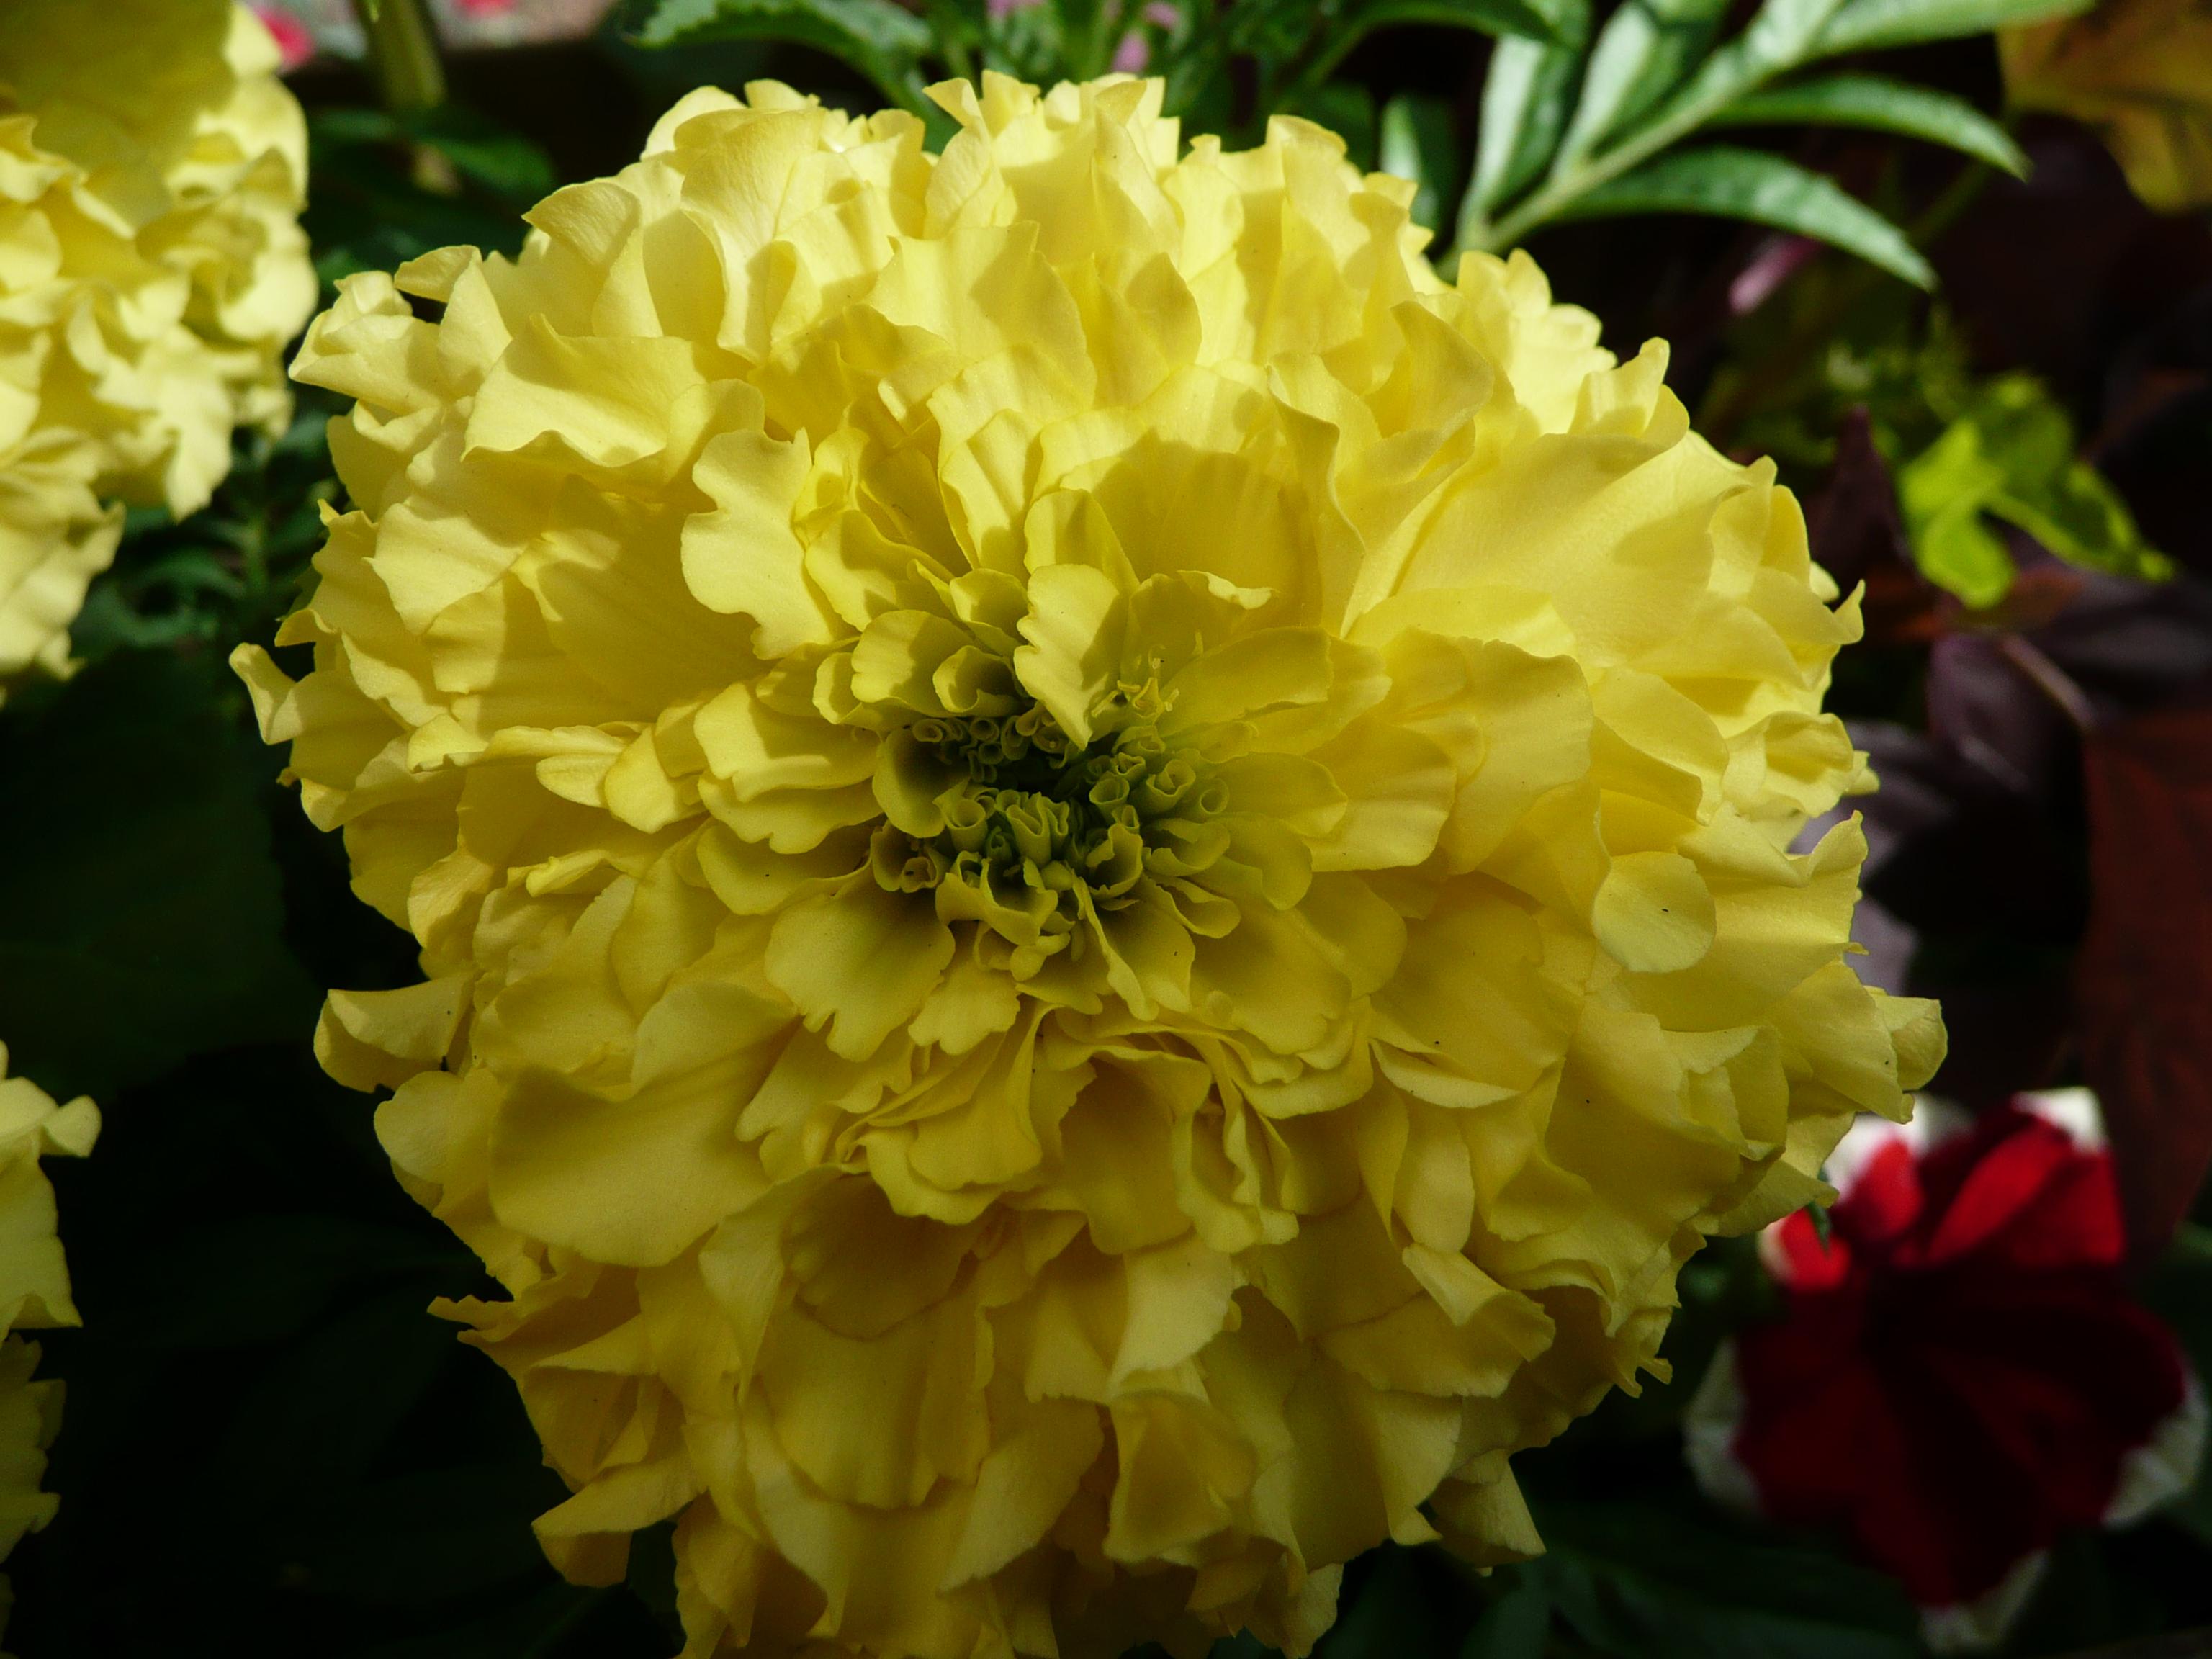 Taking Macro Photo's of flowers